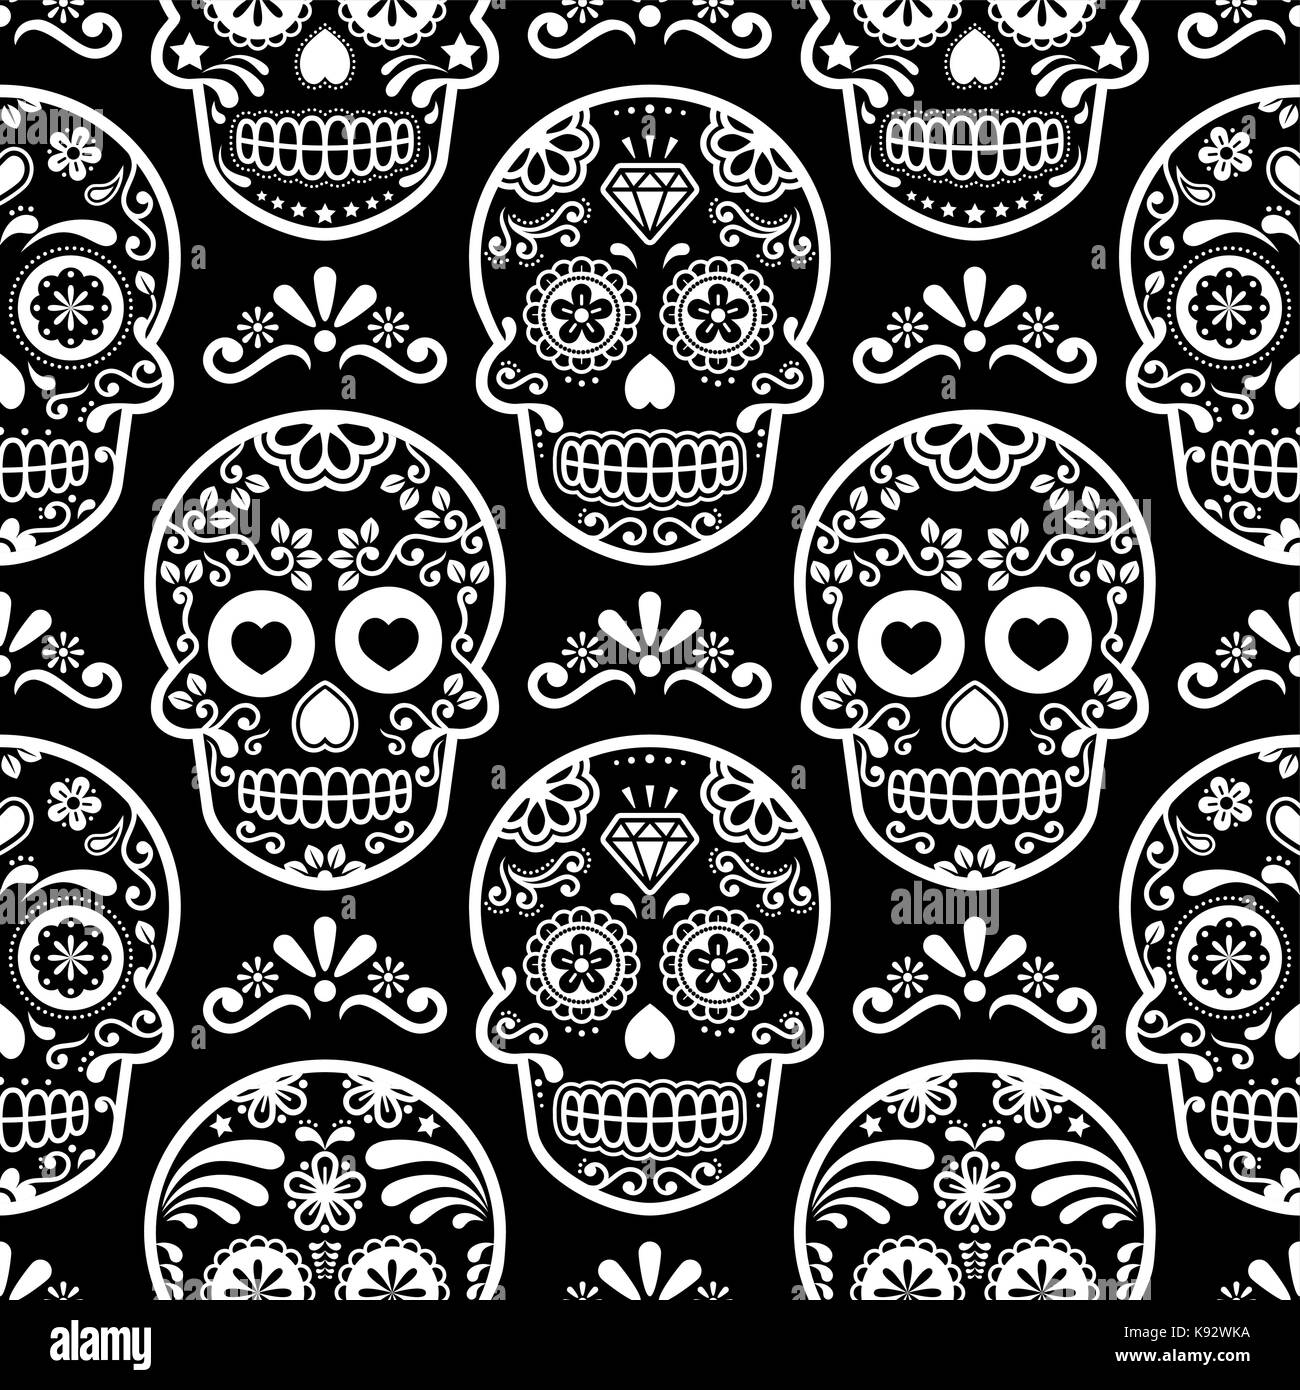 53b53f3ae4f Halloween skull vector seamless pattern, Mexican cute black skulls ...